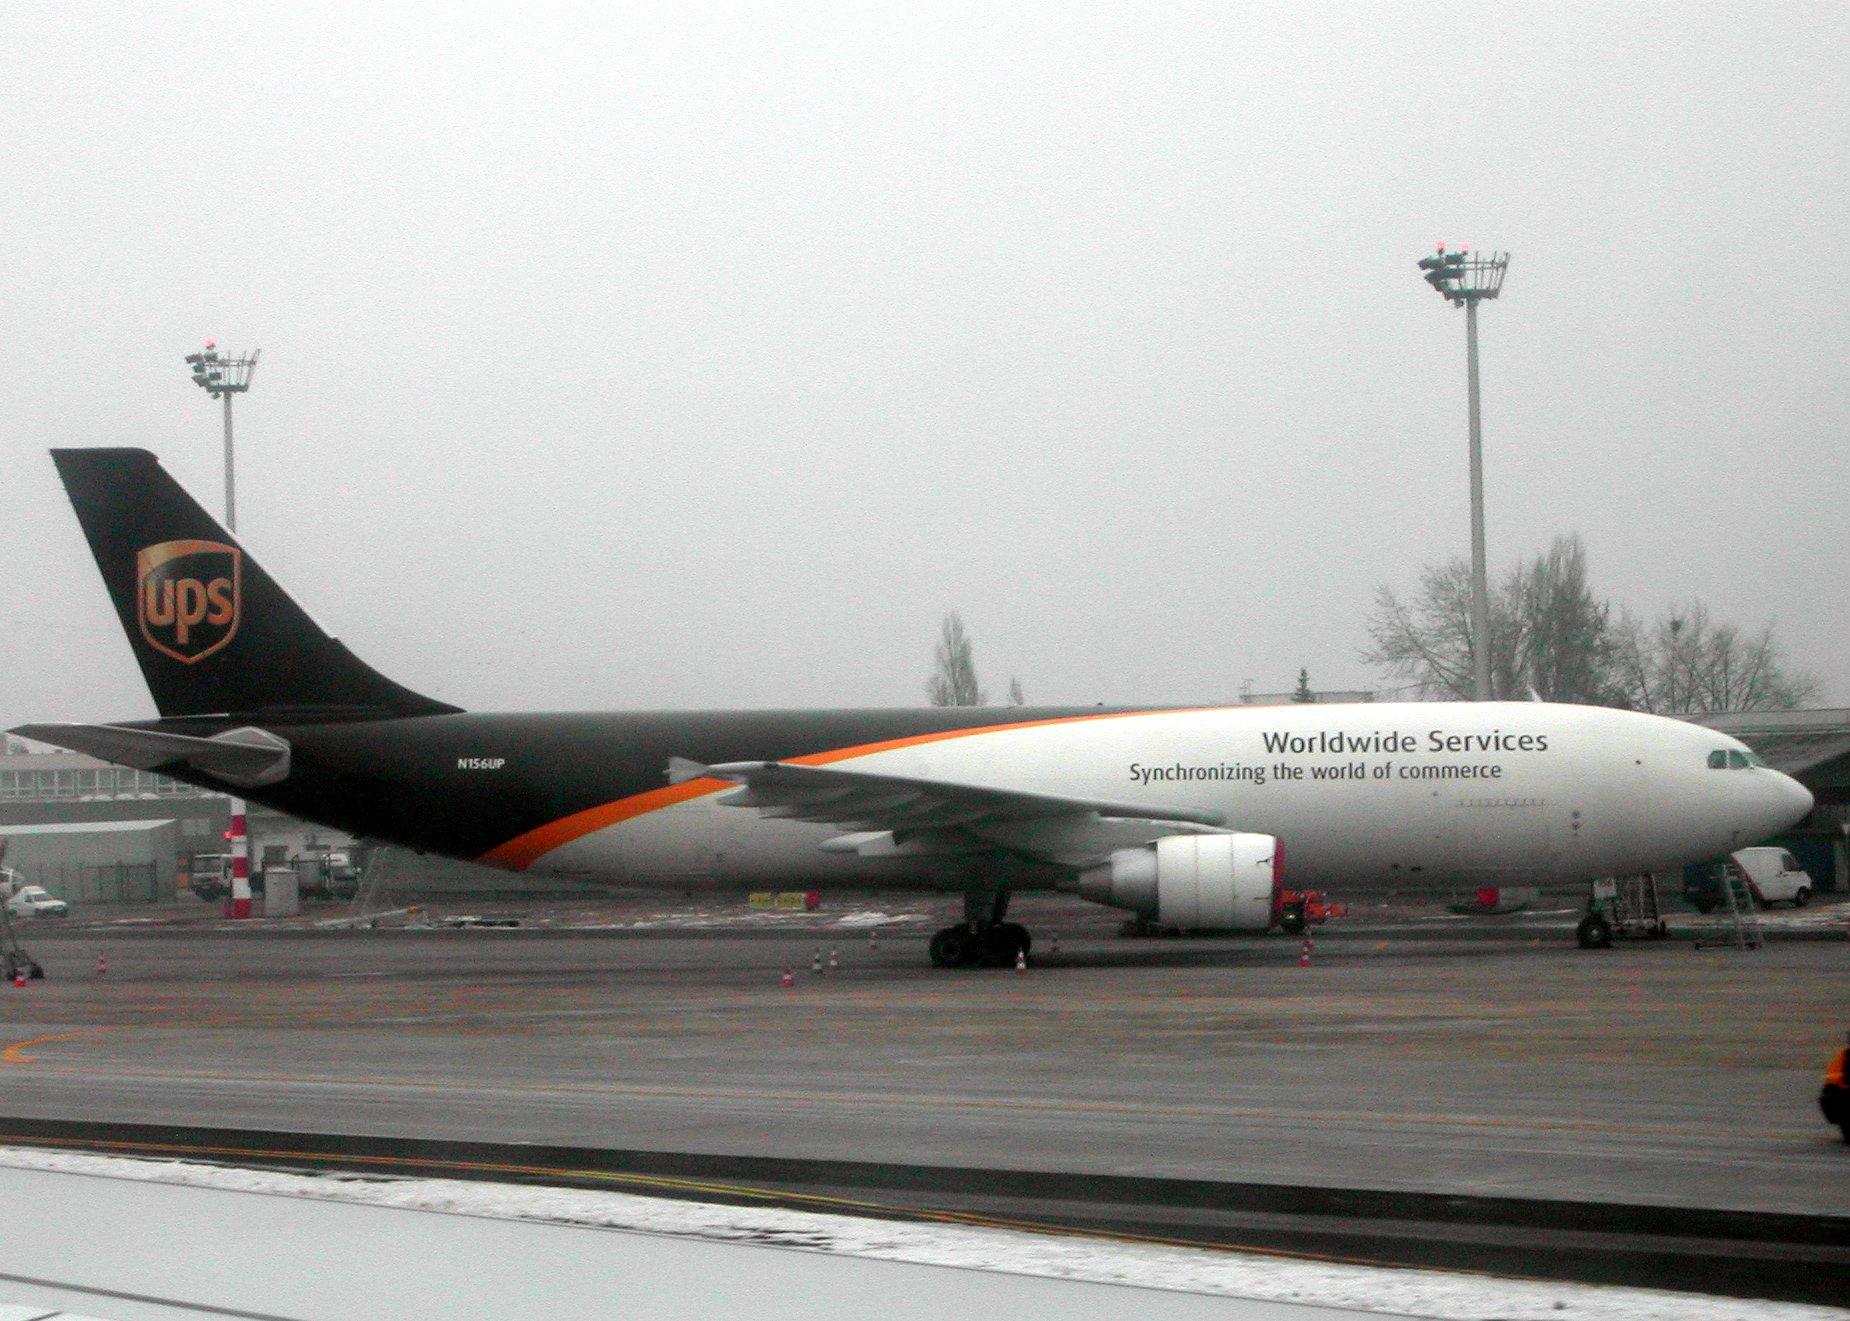 http://upload.wikimedia.org/wikipedia/commons/b/be/Airbus_A300F4-622R_UPS.jpg